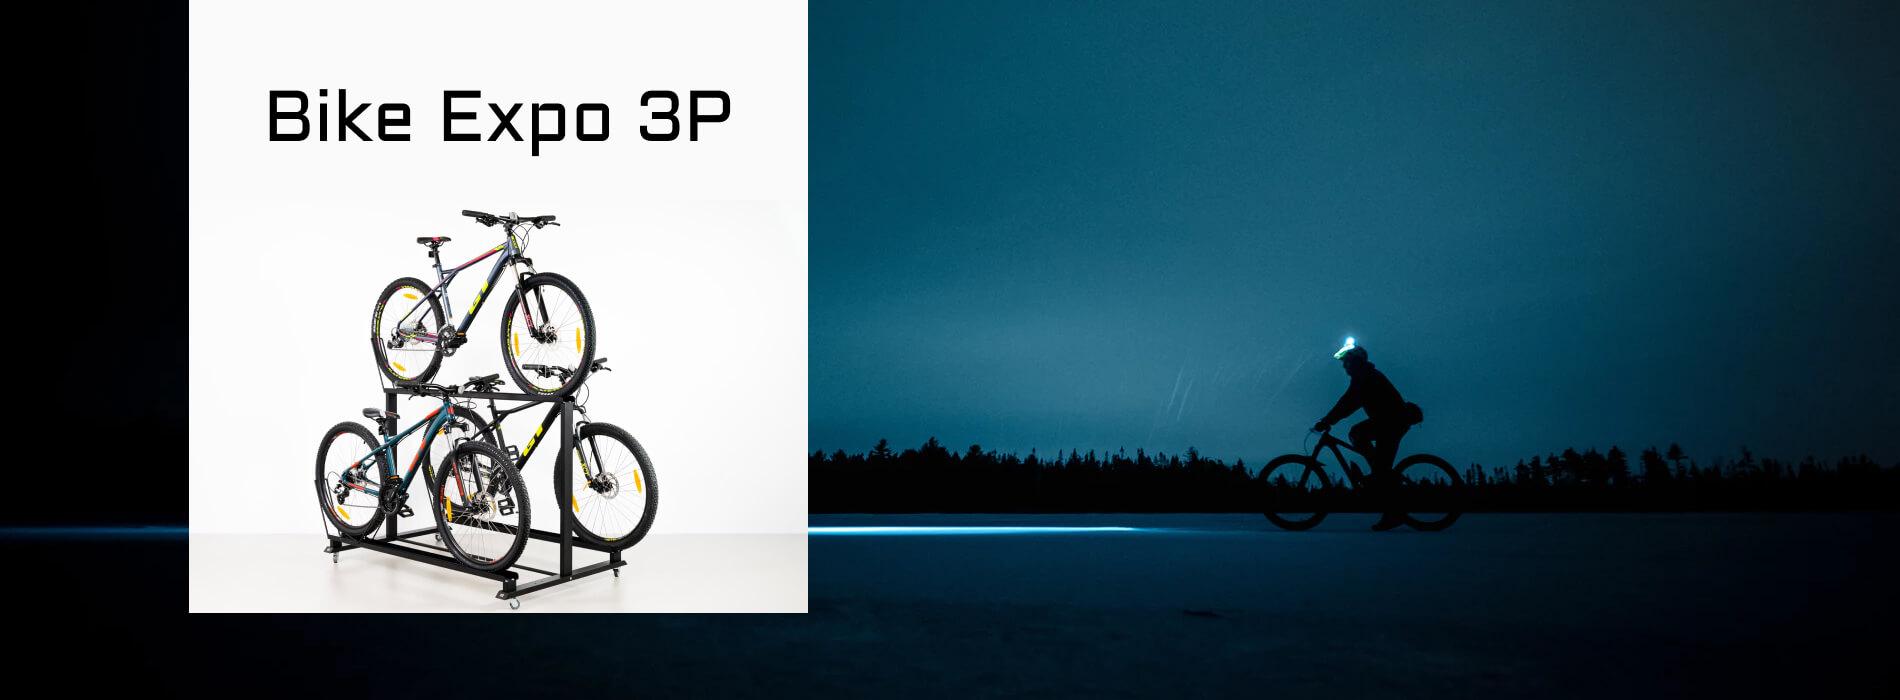 RTR_-_banner_-_Bike_Expo_3P_-_1900x700